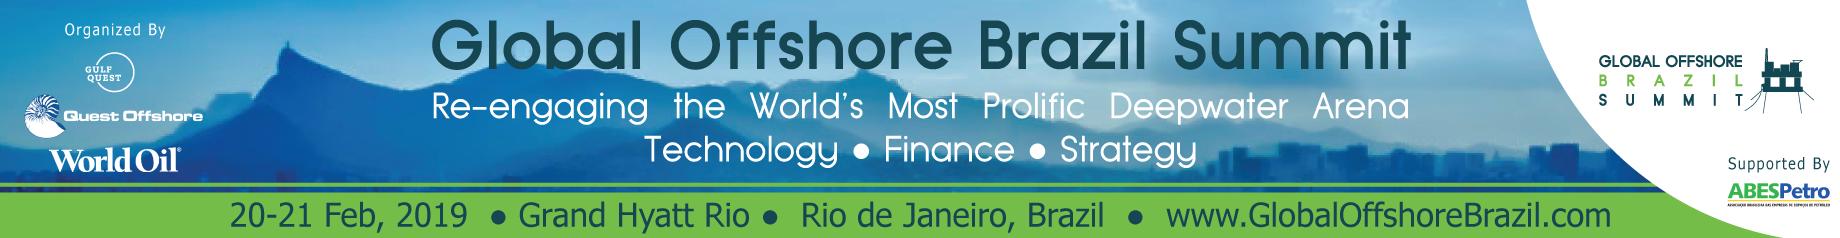 Global Offshore Brazil Summit 2019